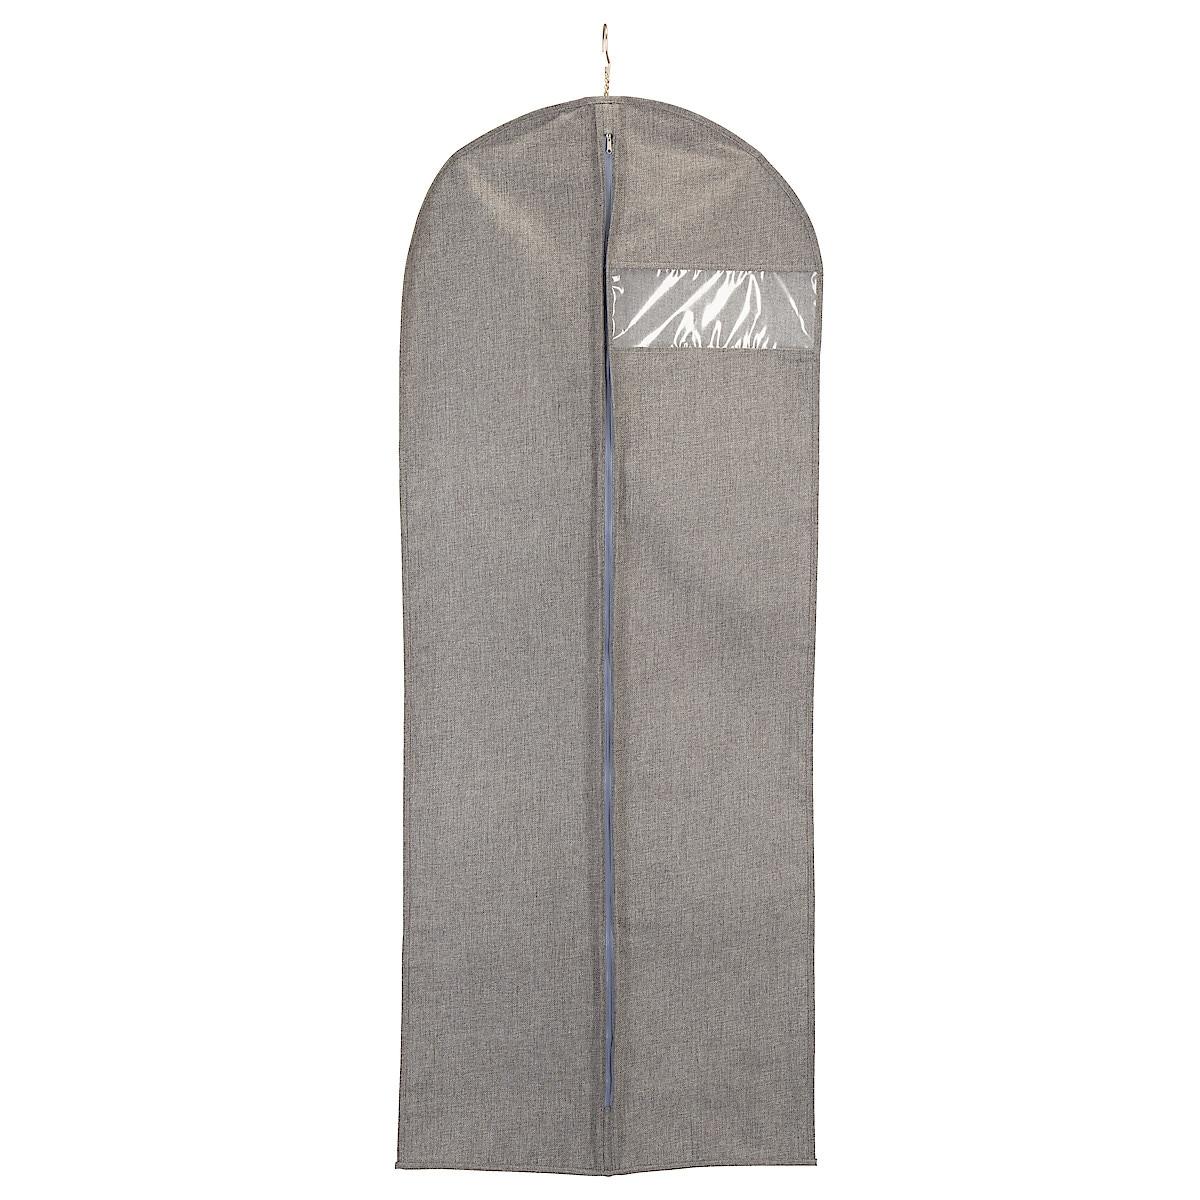 Klespose med glidelås, hengende